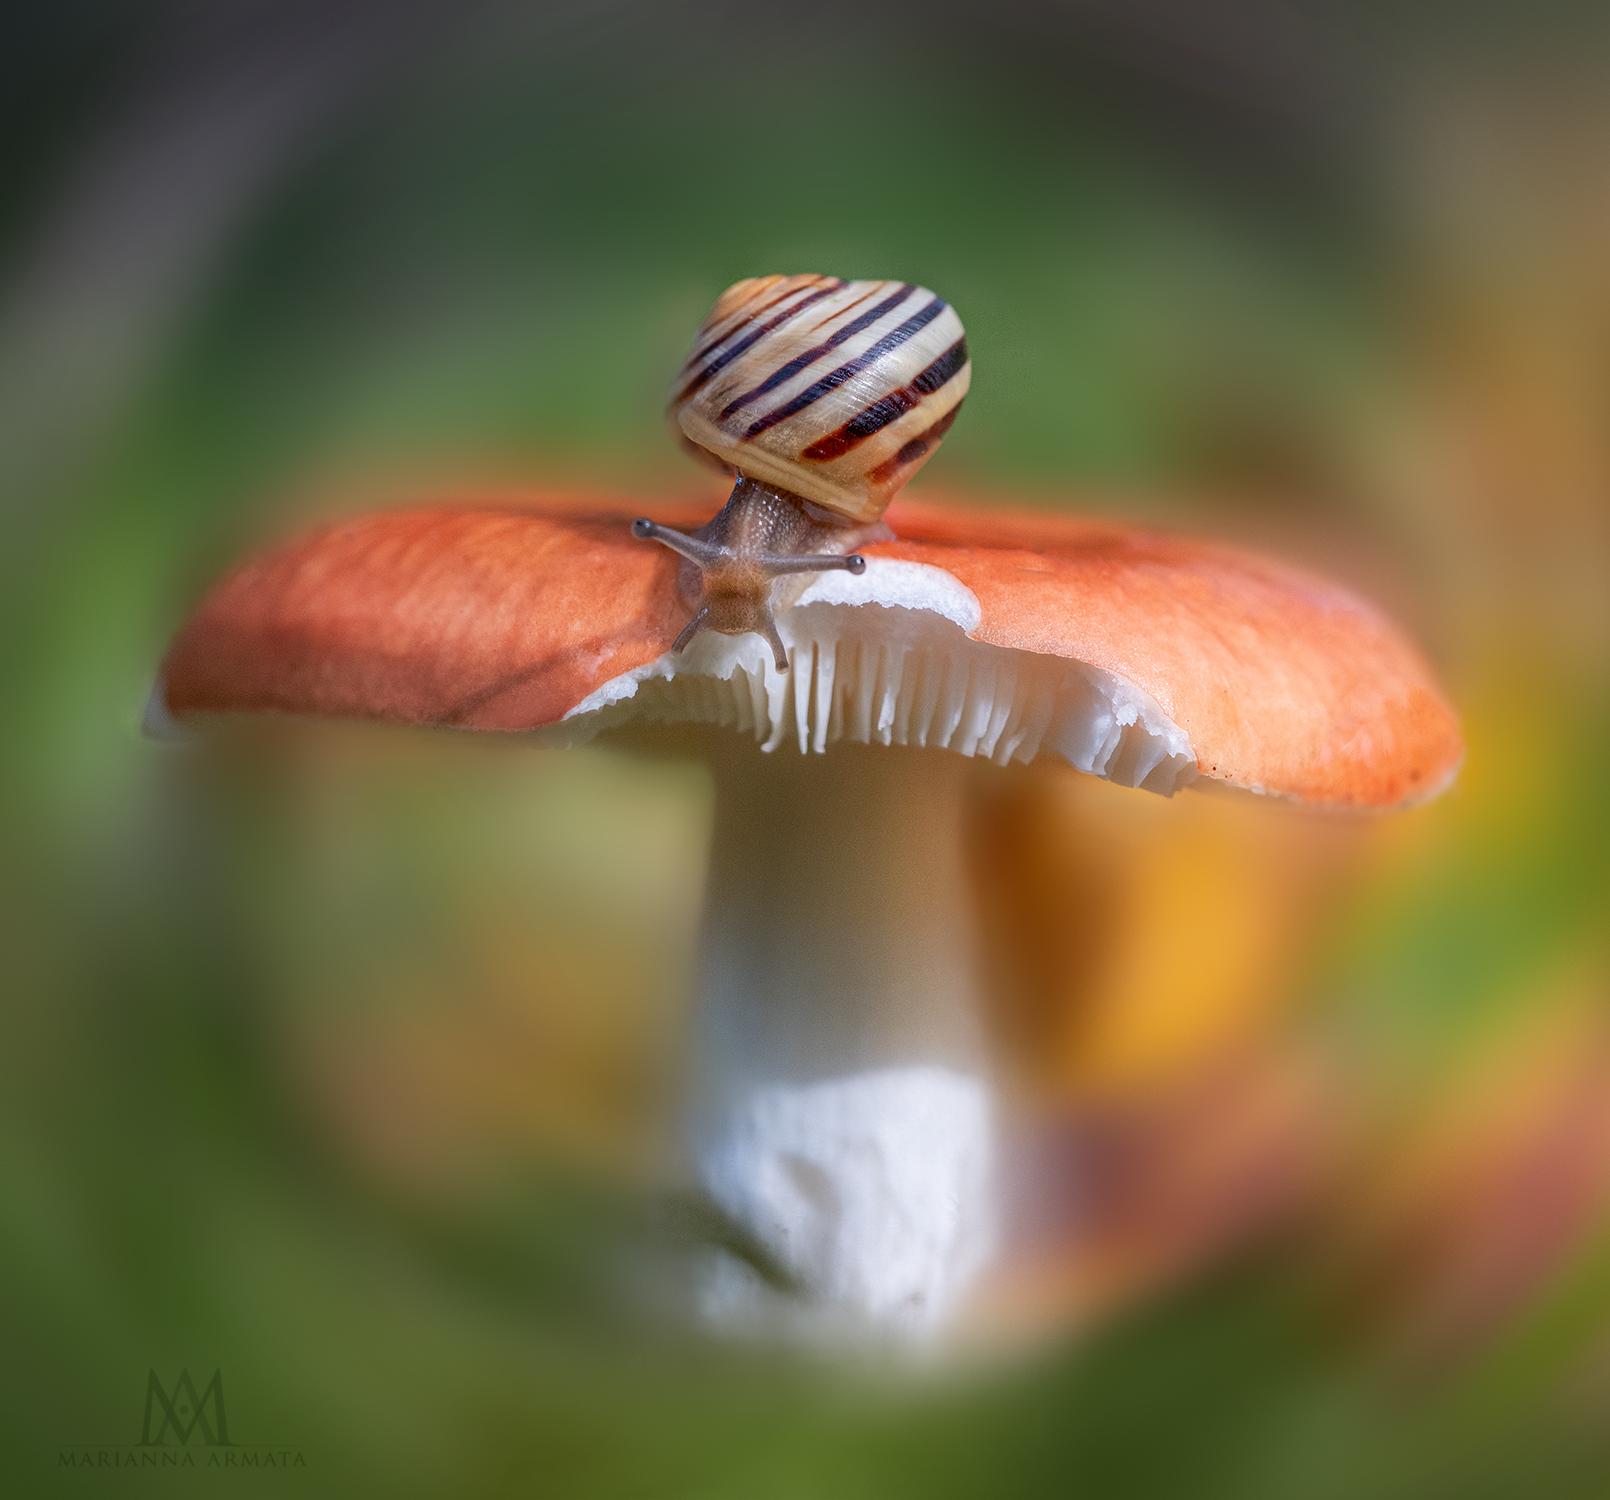 Russula + snail